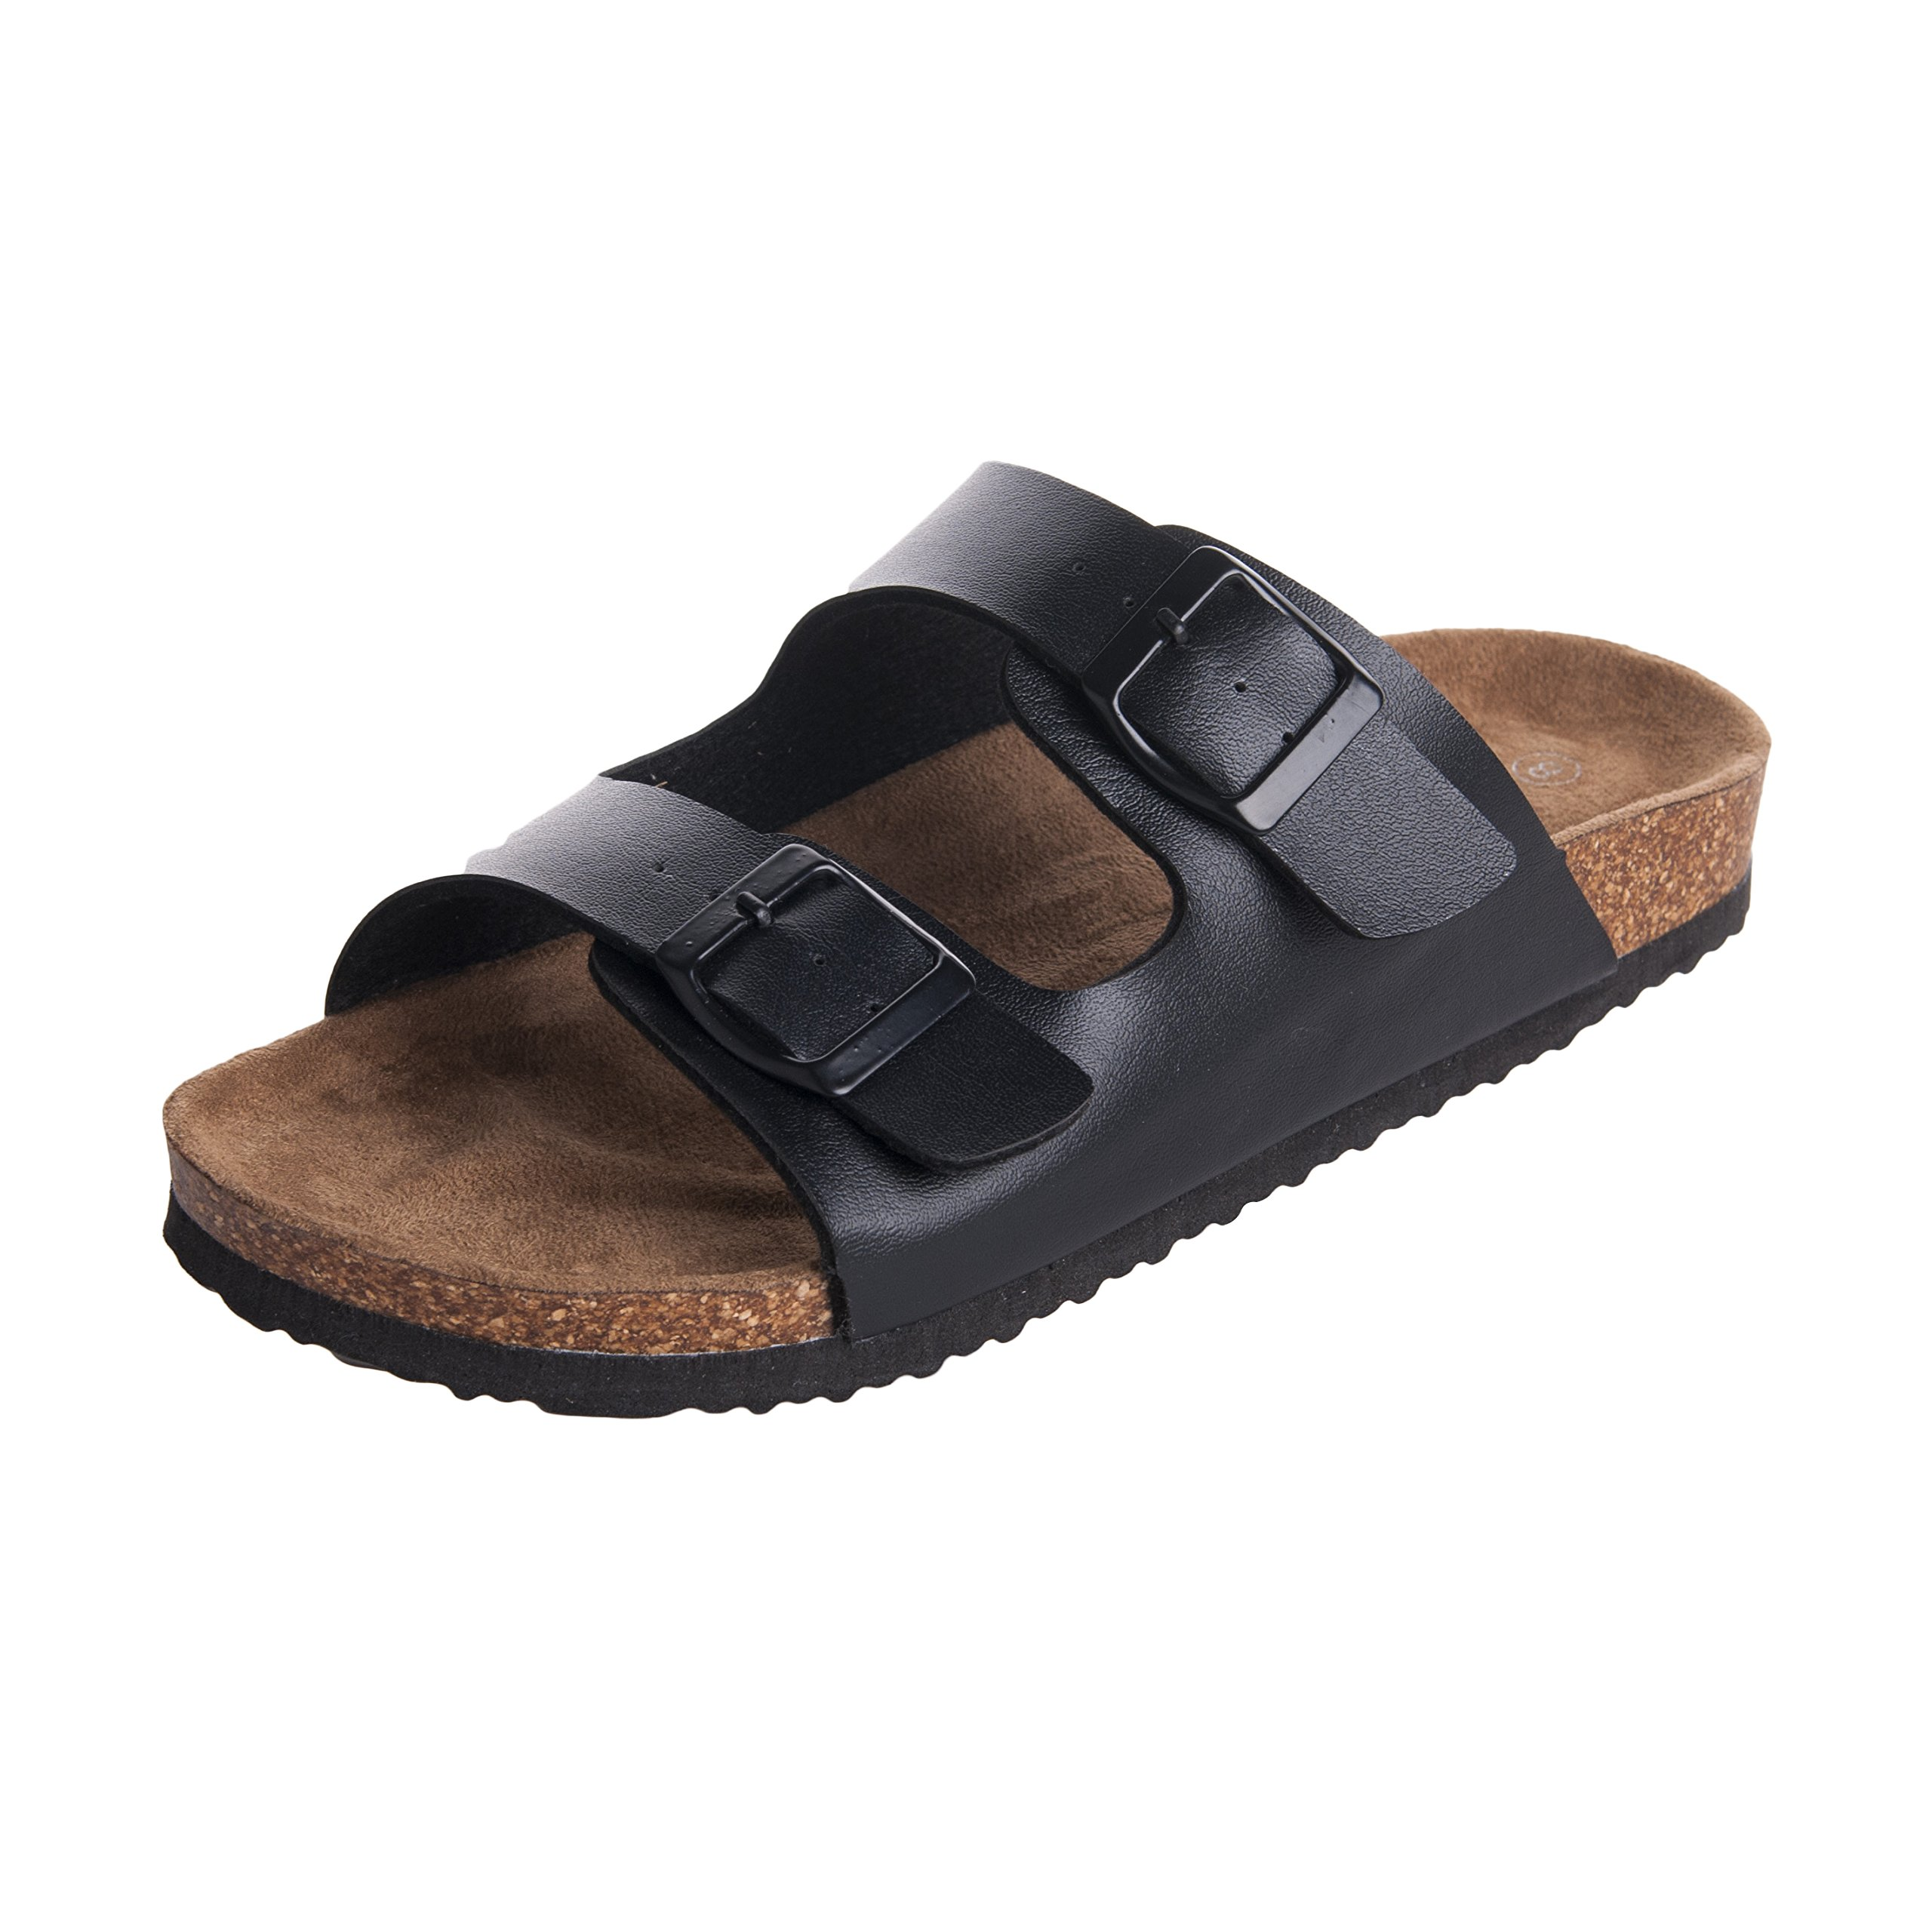 WTW Men's Arizona 2-Strap Cork Footbed Sandal Size 11 Black by WTW